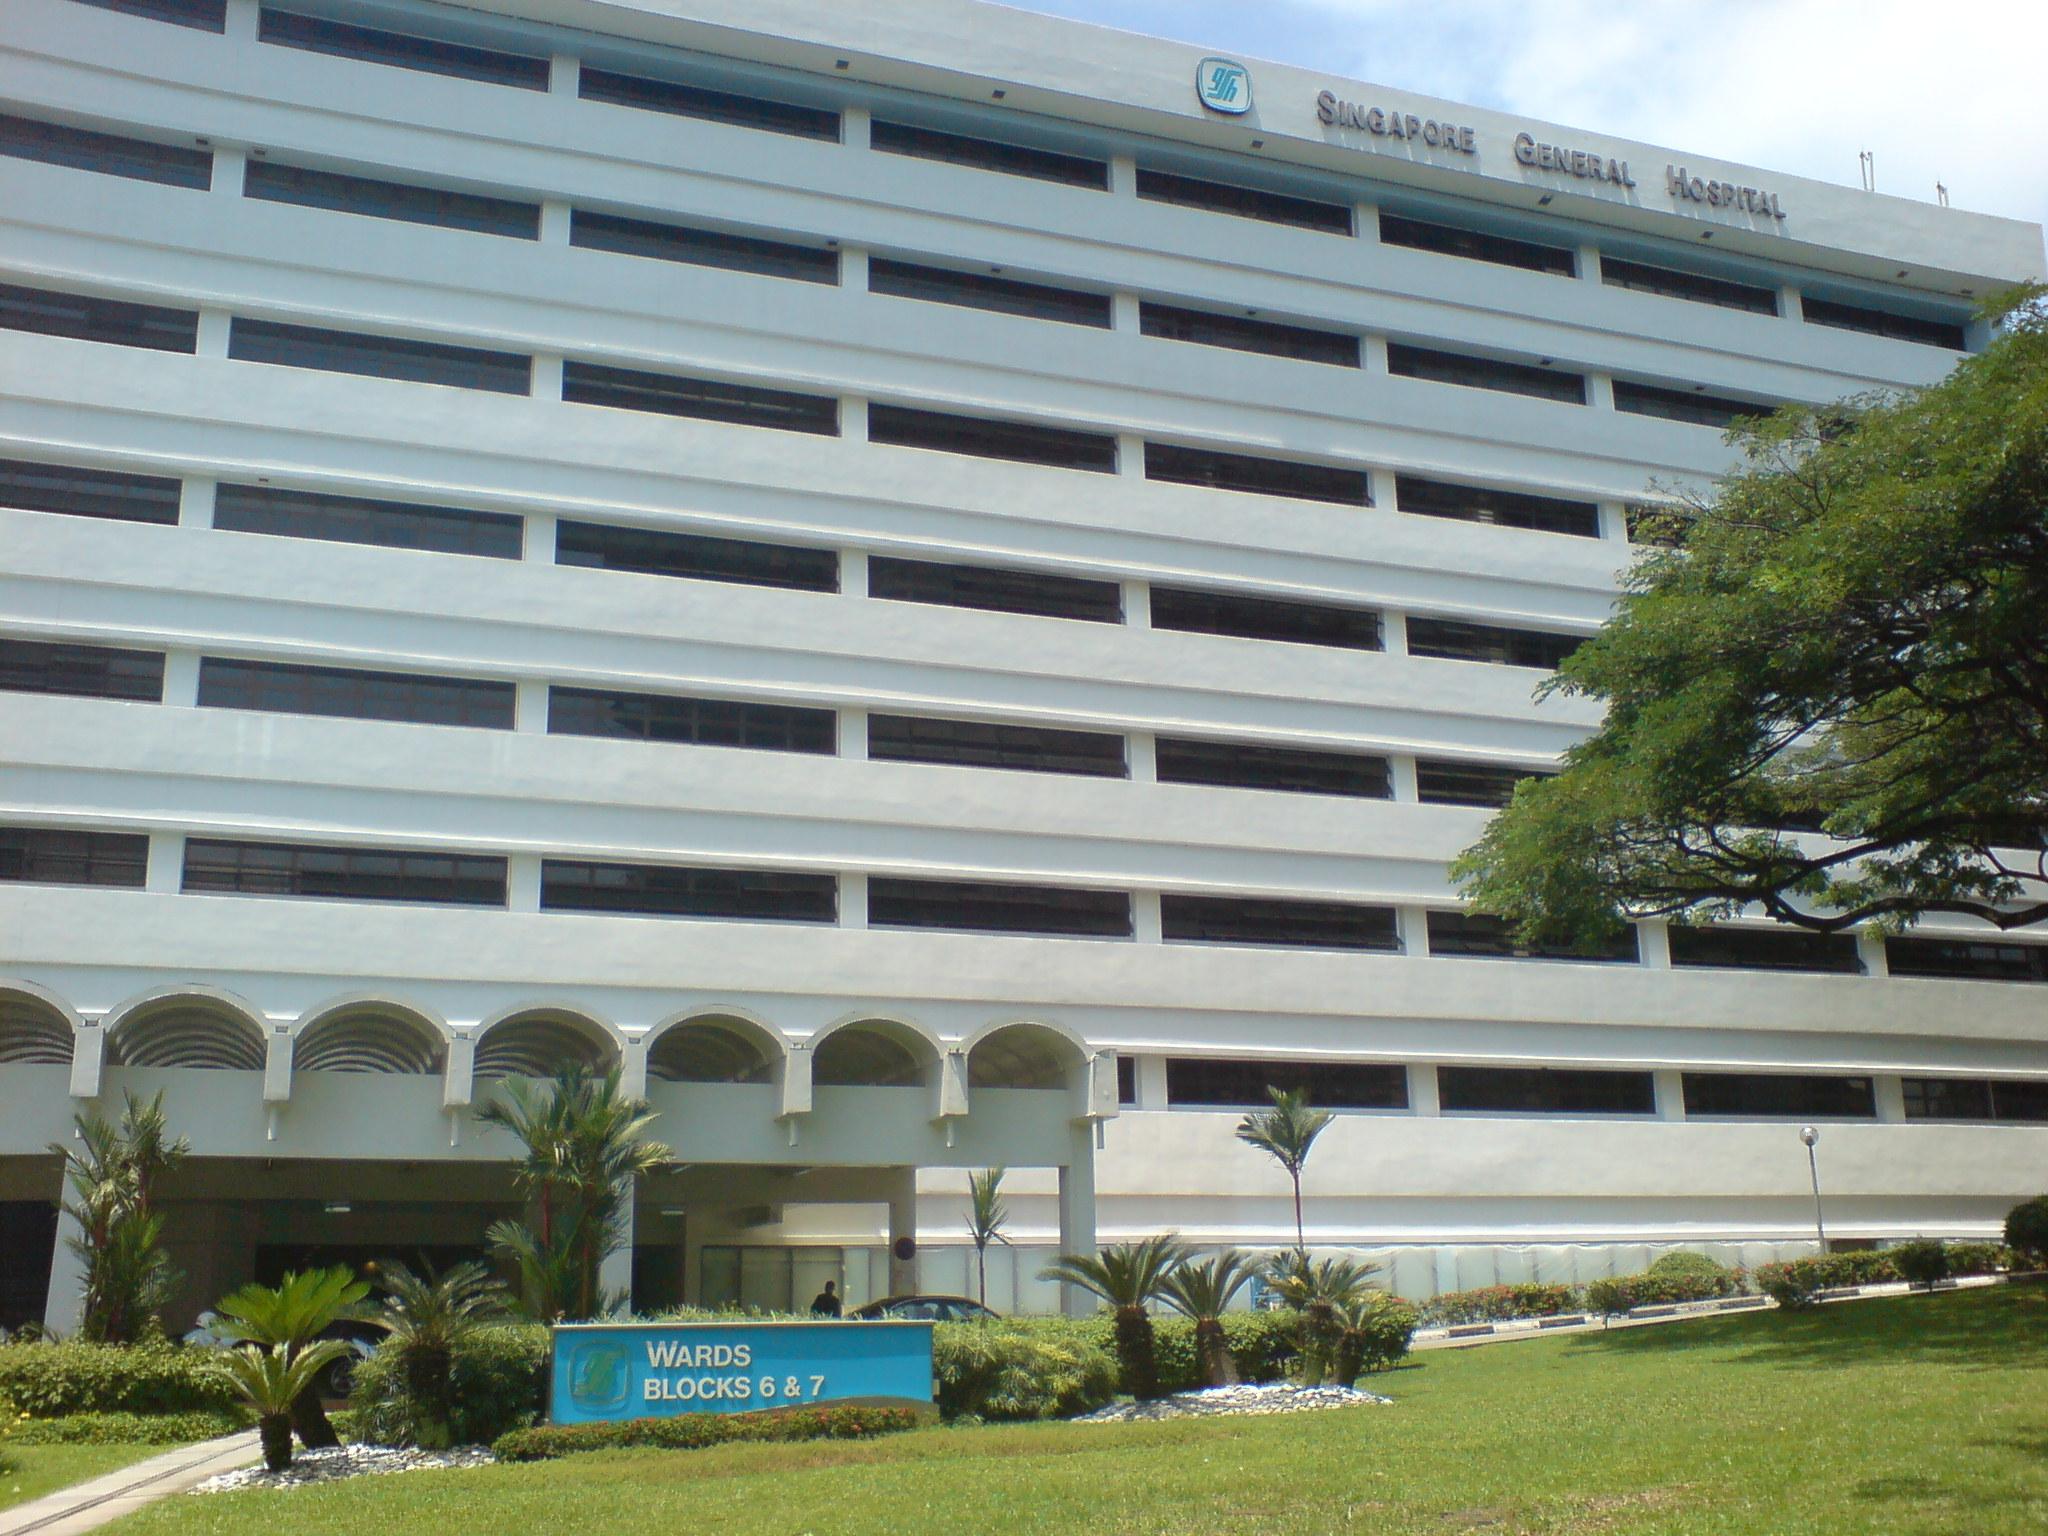 History of Singapore General Hospital - Wikipedia